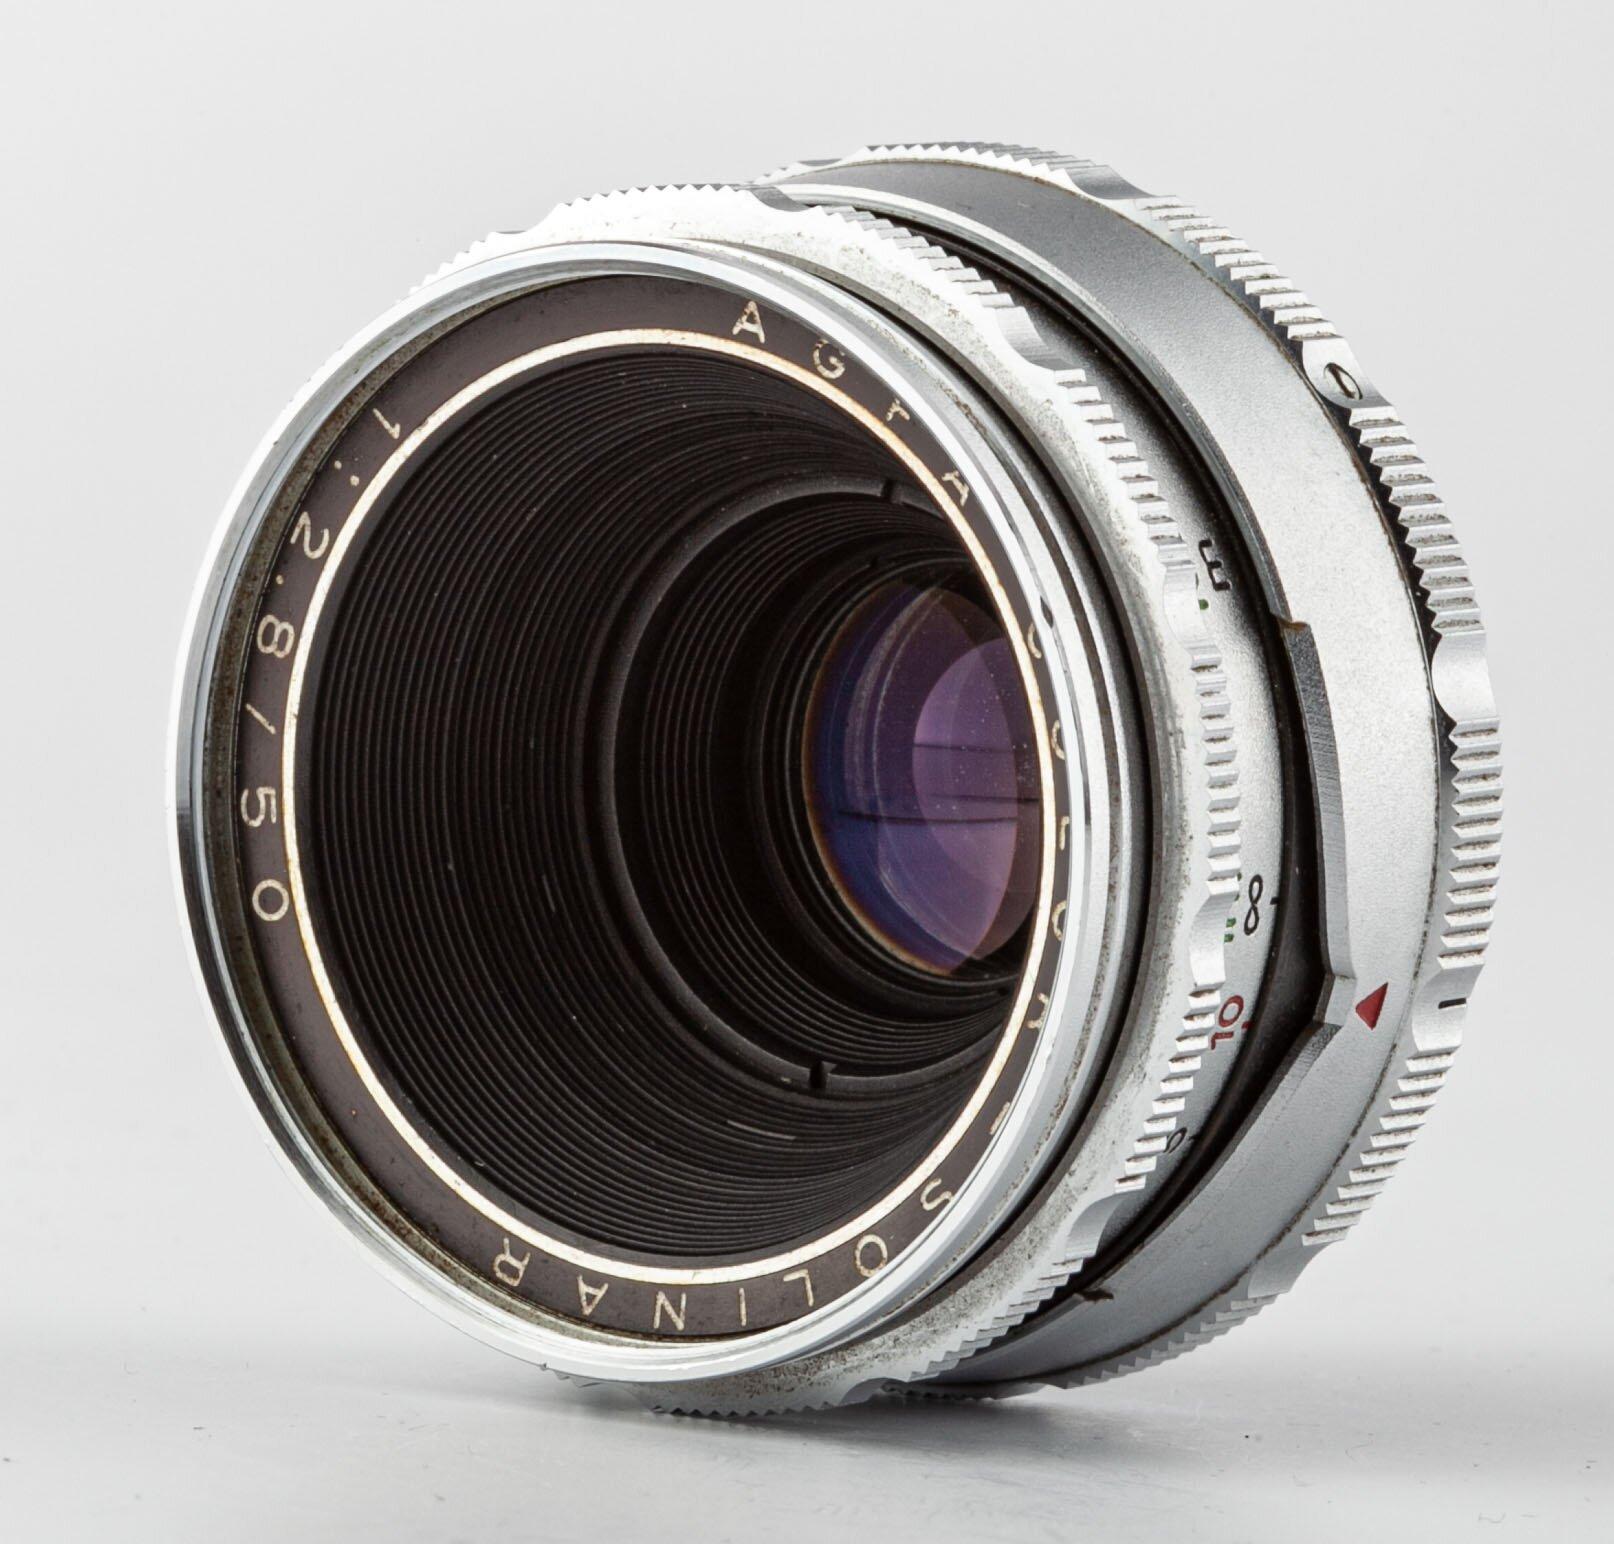 Agfa Color-Solinar 2,8/50mm Agfa Ambiflex